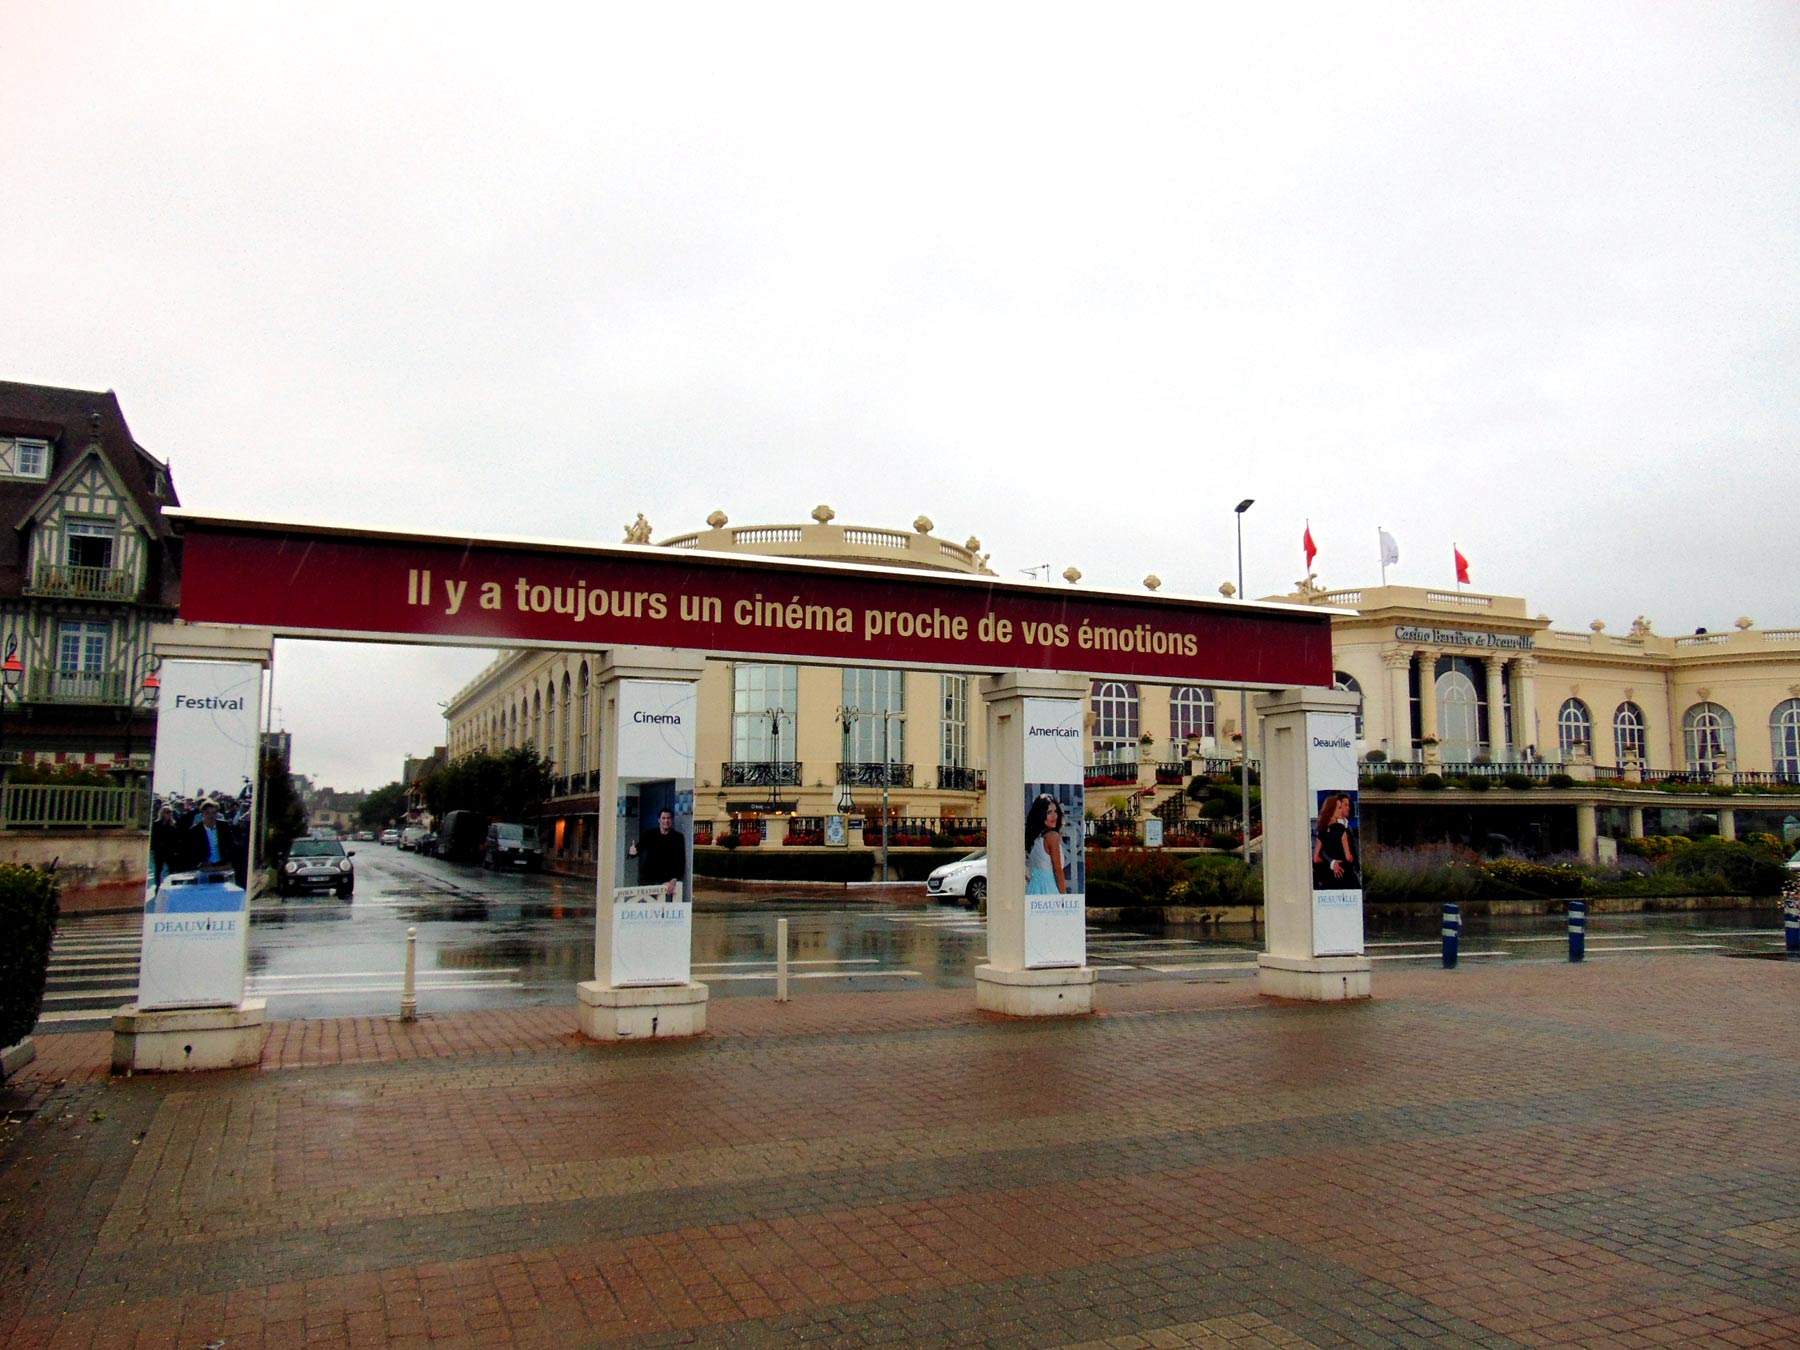 кинофестивали в Довиле экскурсия из Парижа